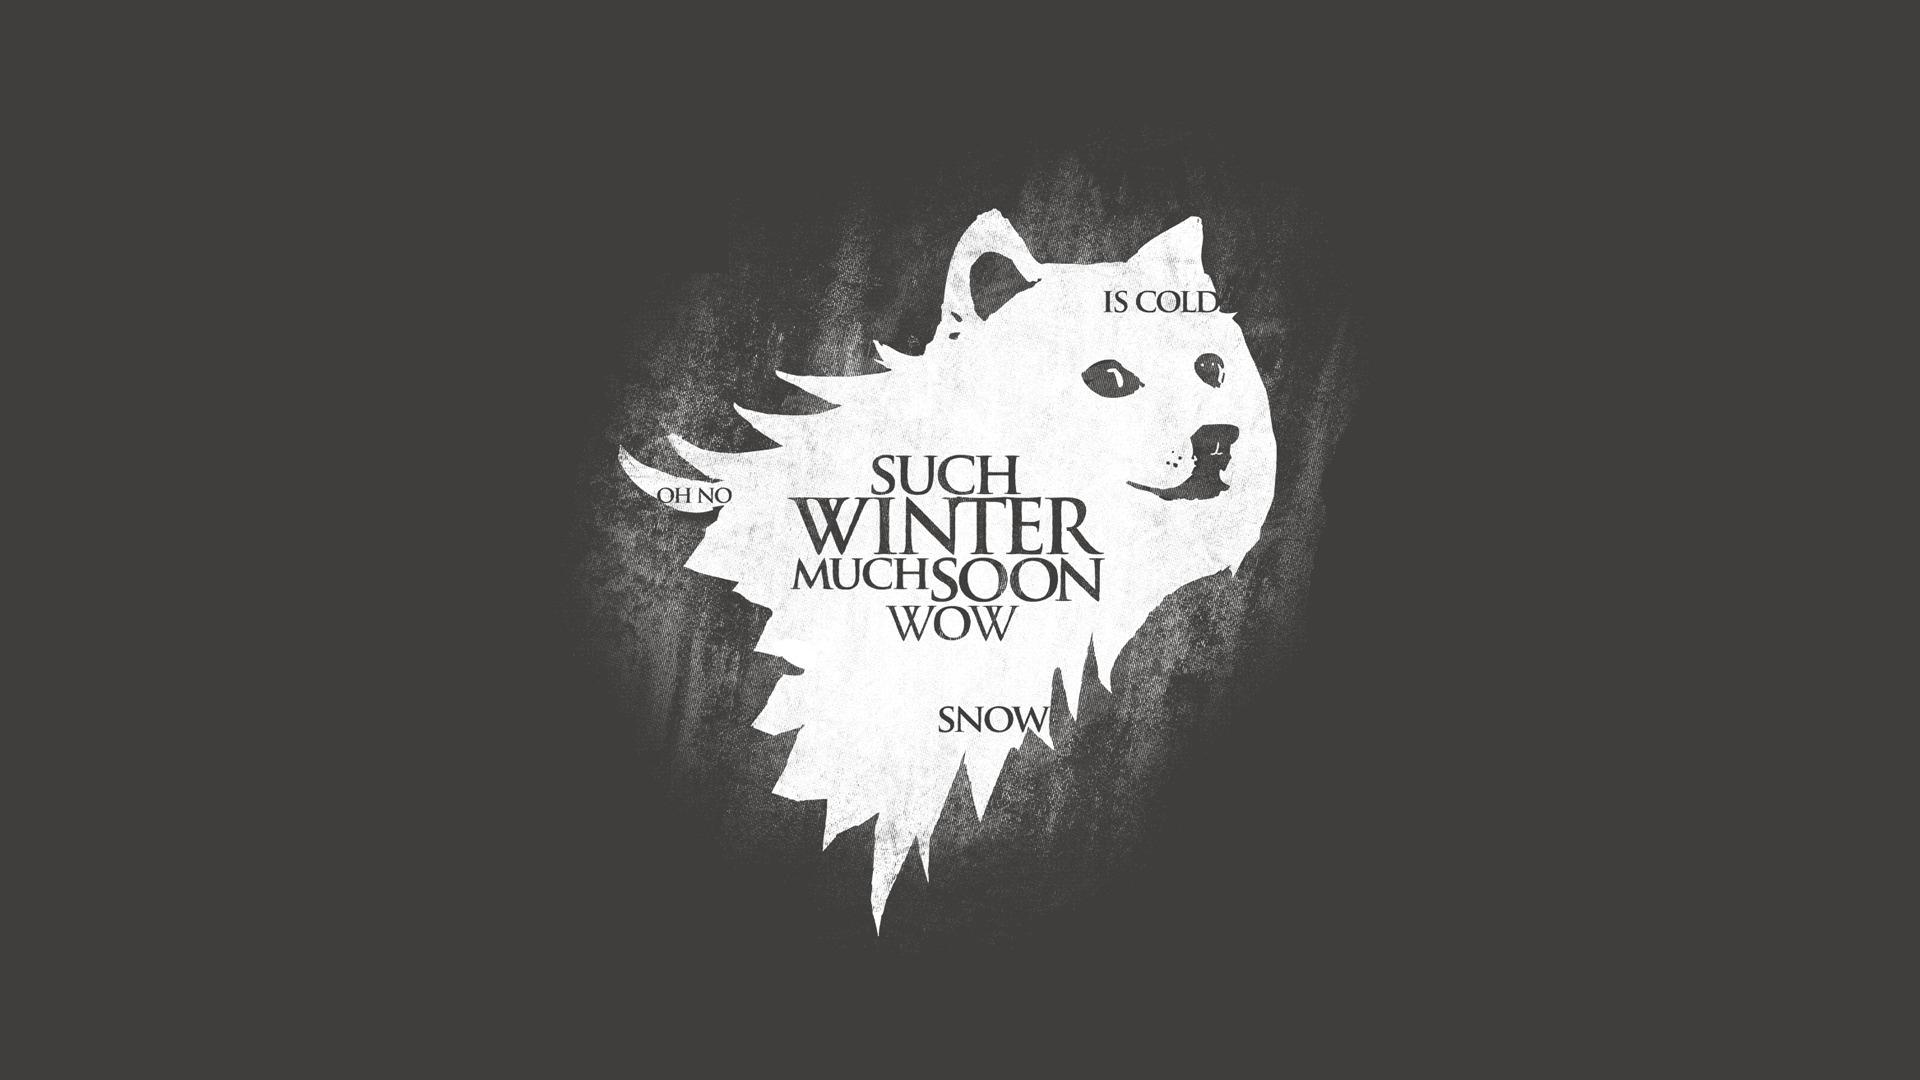 game of thrones start doge download wallpaper start, doge, game of thrones, meme, section,Doge Meme Wallpaper